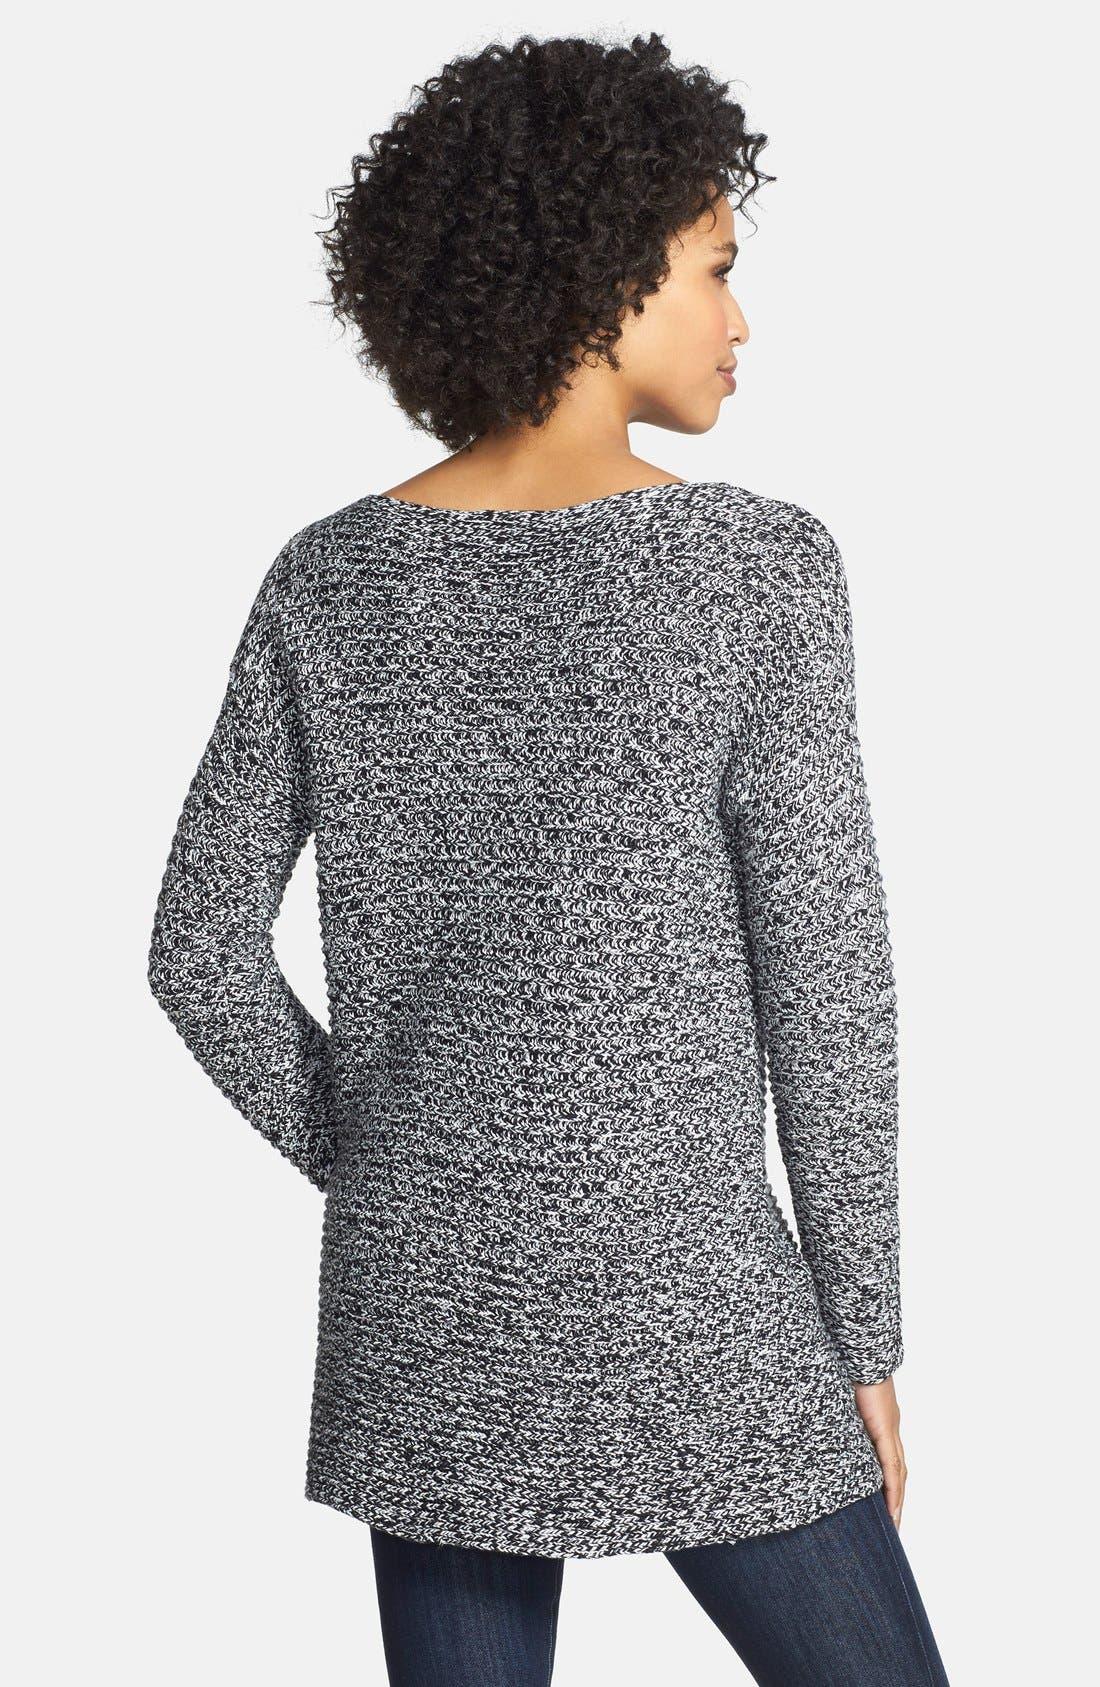 Boatneck Sweater,                             Alternate thumbnail 2, color,                             002